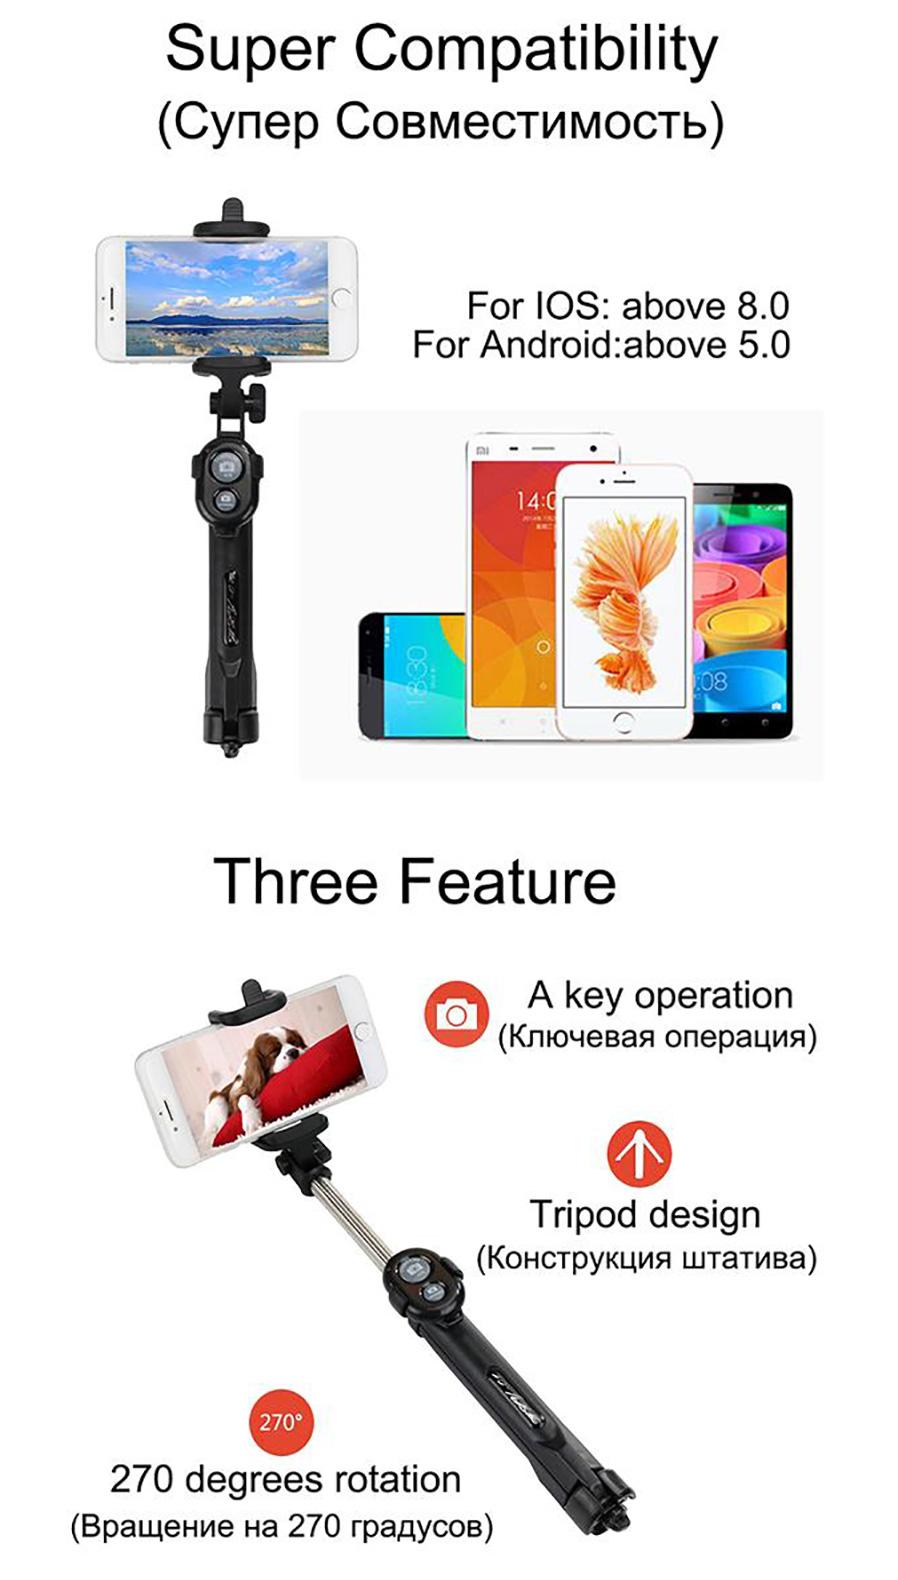 i.ibb.co/fXc1wS3/Bast-o-Trip-Dobr-vel-Selfie-para-Smartphone-NRZBN9-EY.jpg